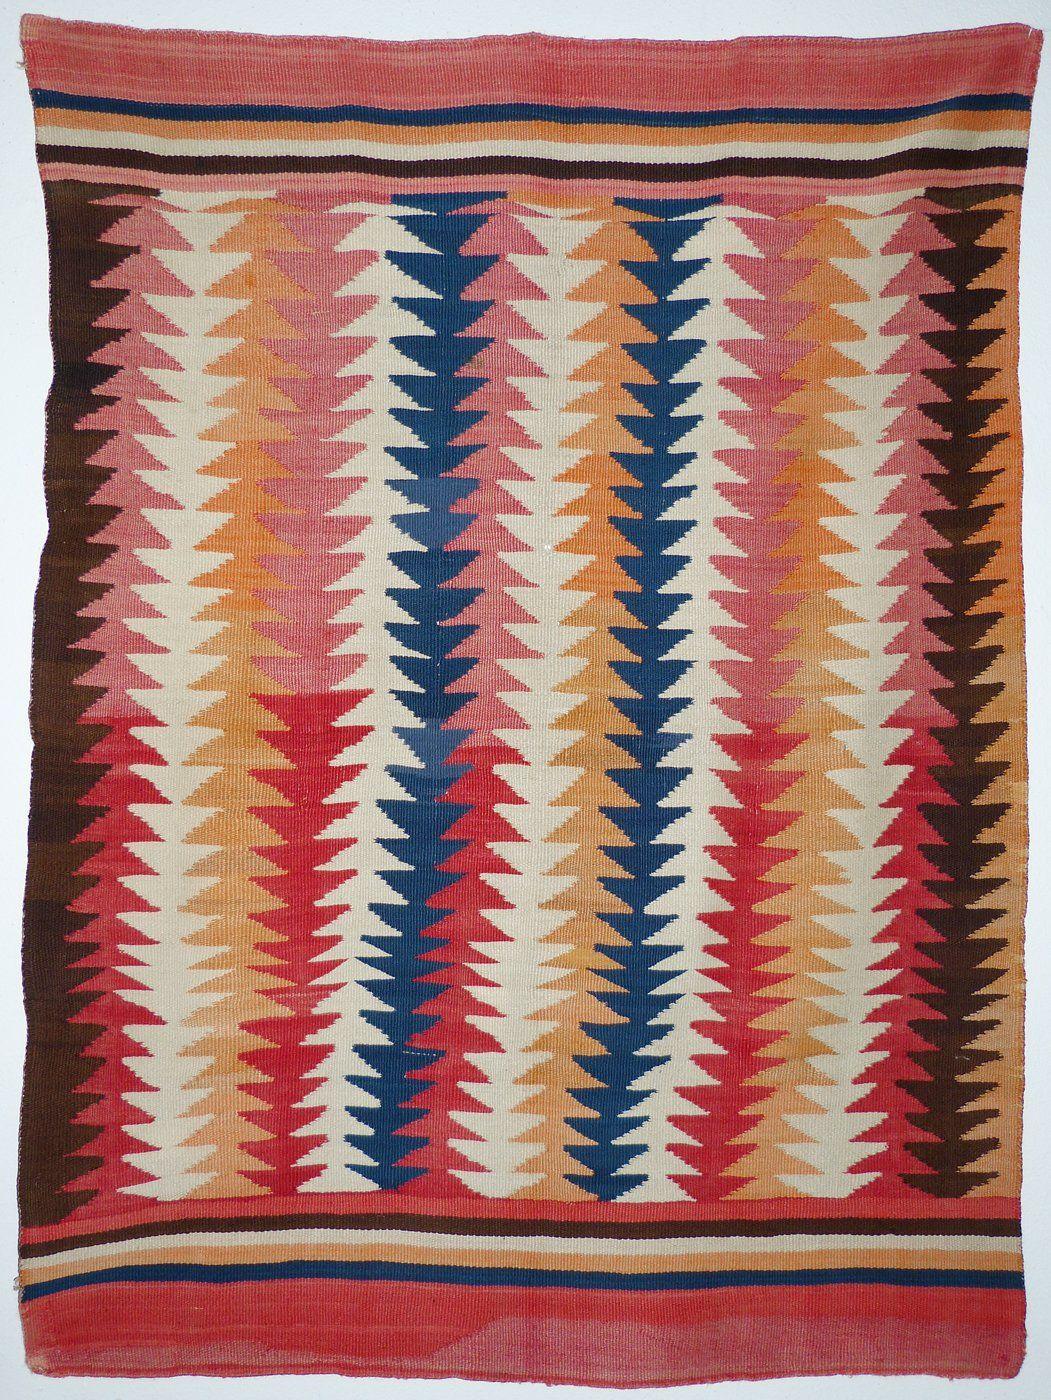 Navajo Transitional Blanket With Indigo C 1880 Shiprock Santa Fe